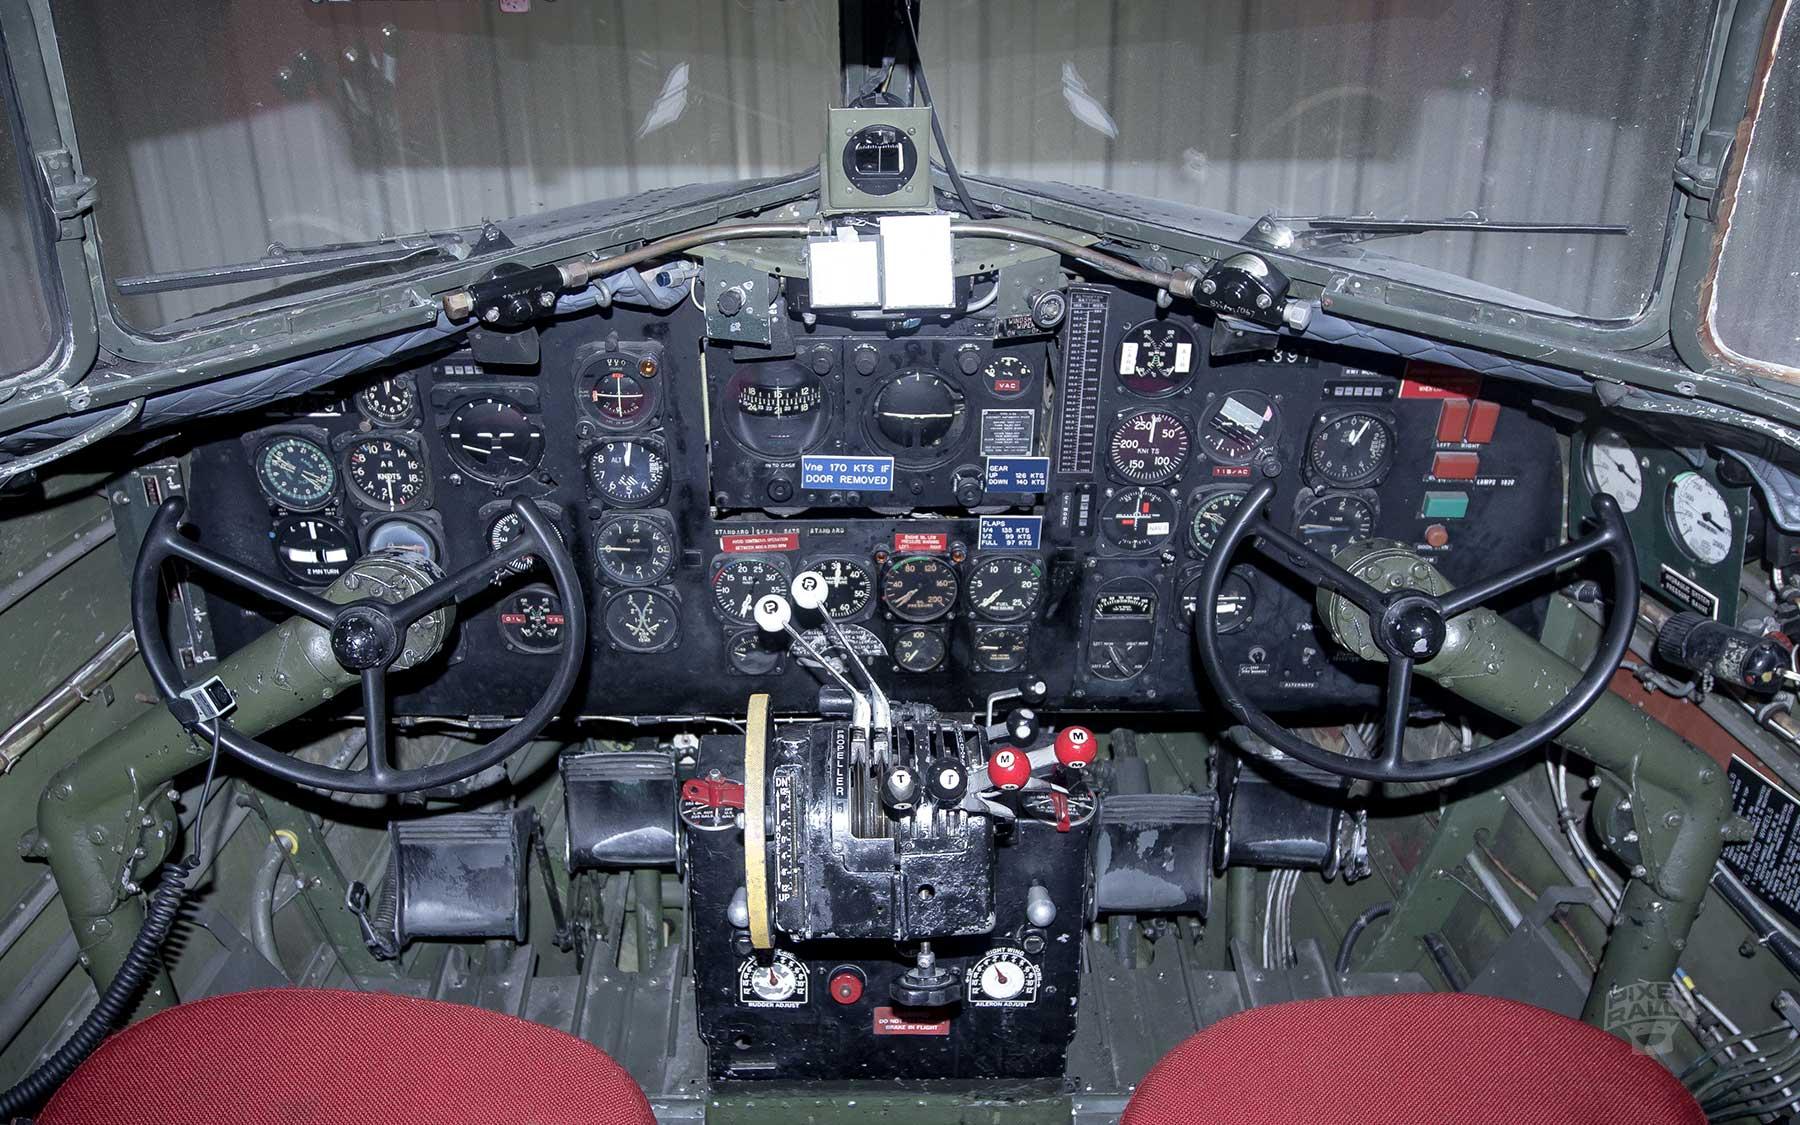 FL-WarbirdsMuseum-cockpit-controls